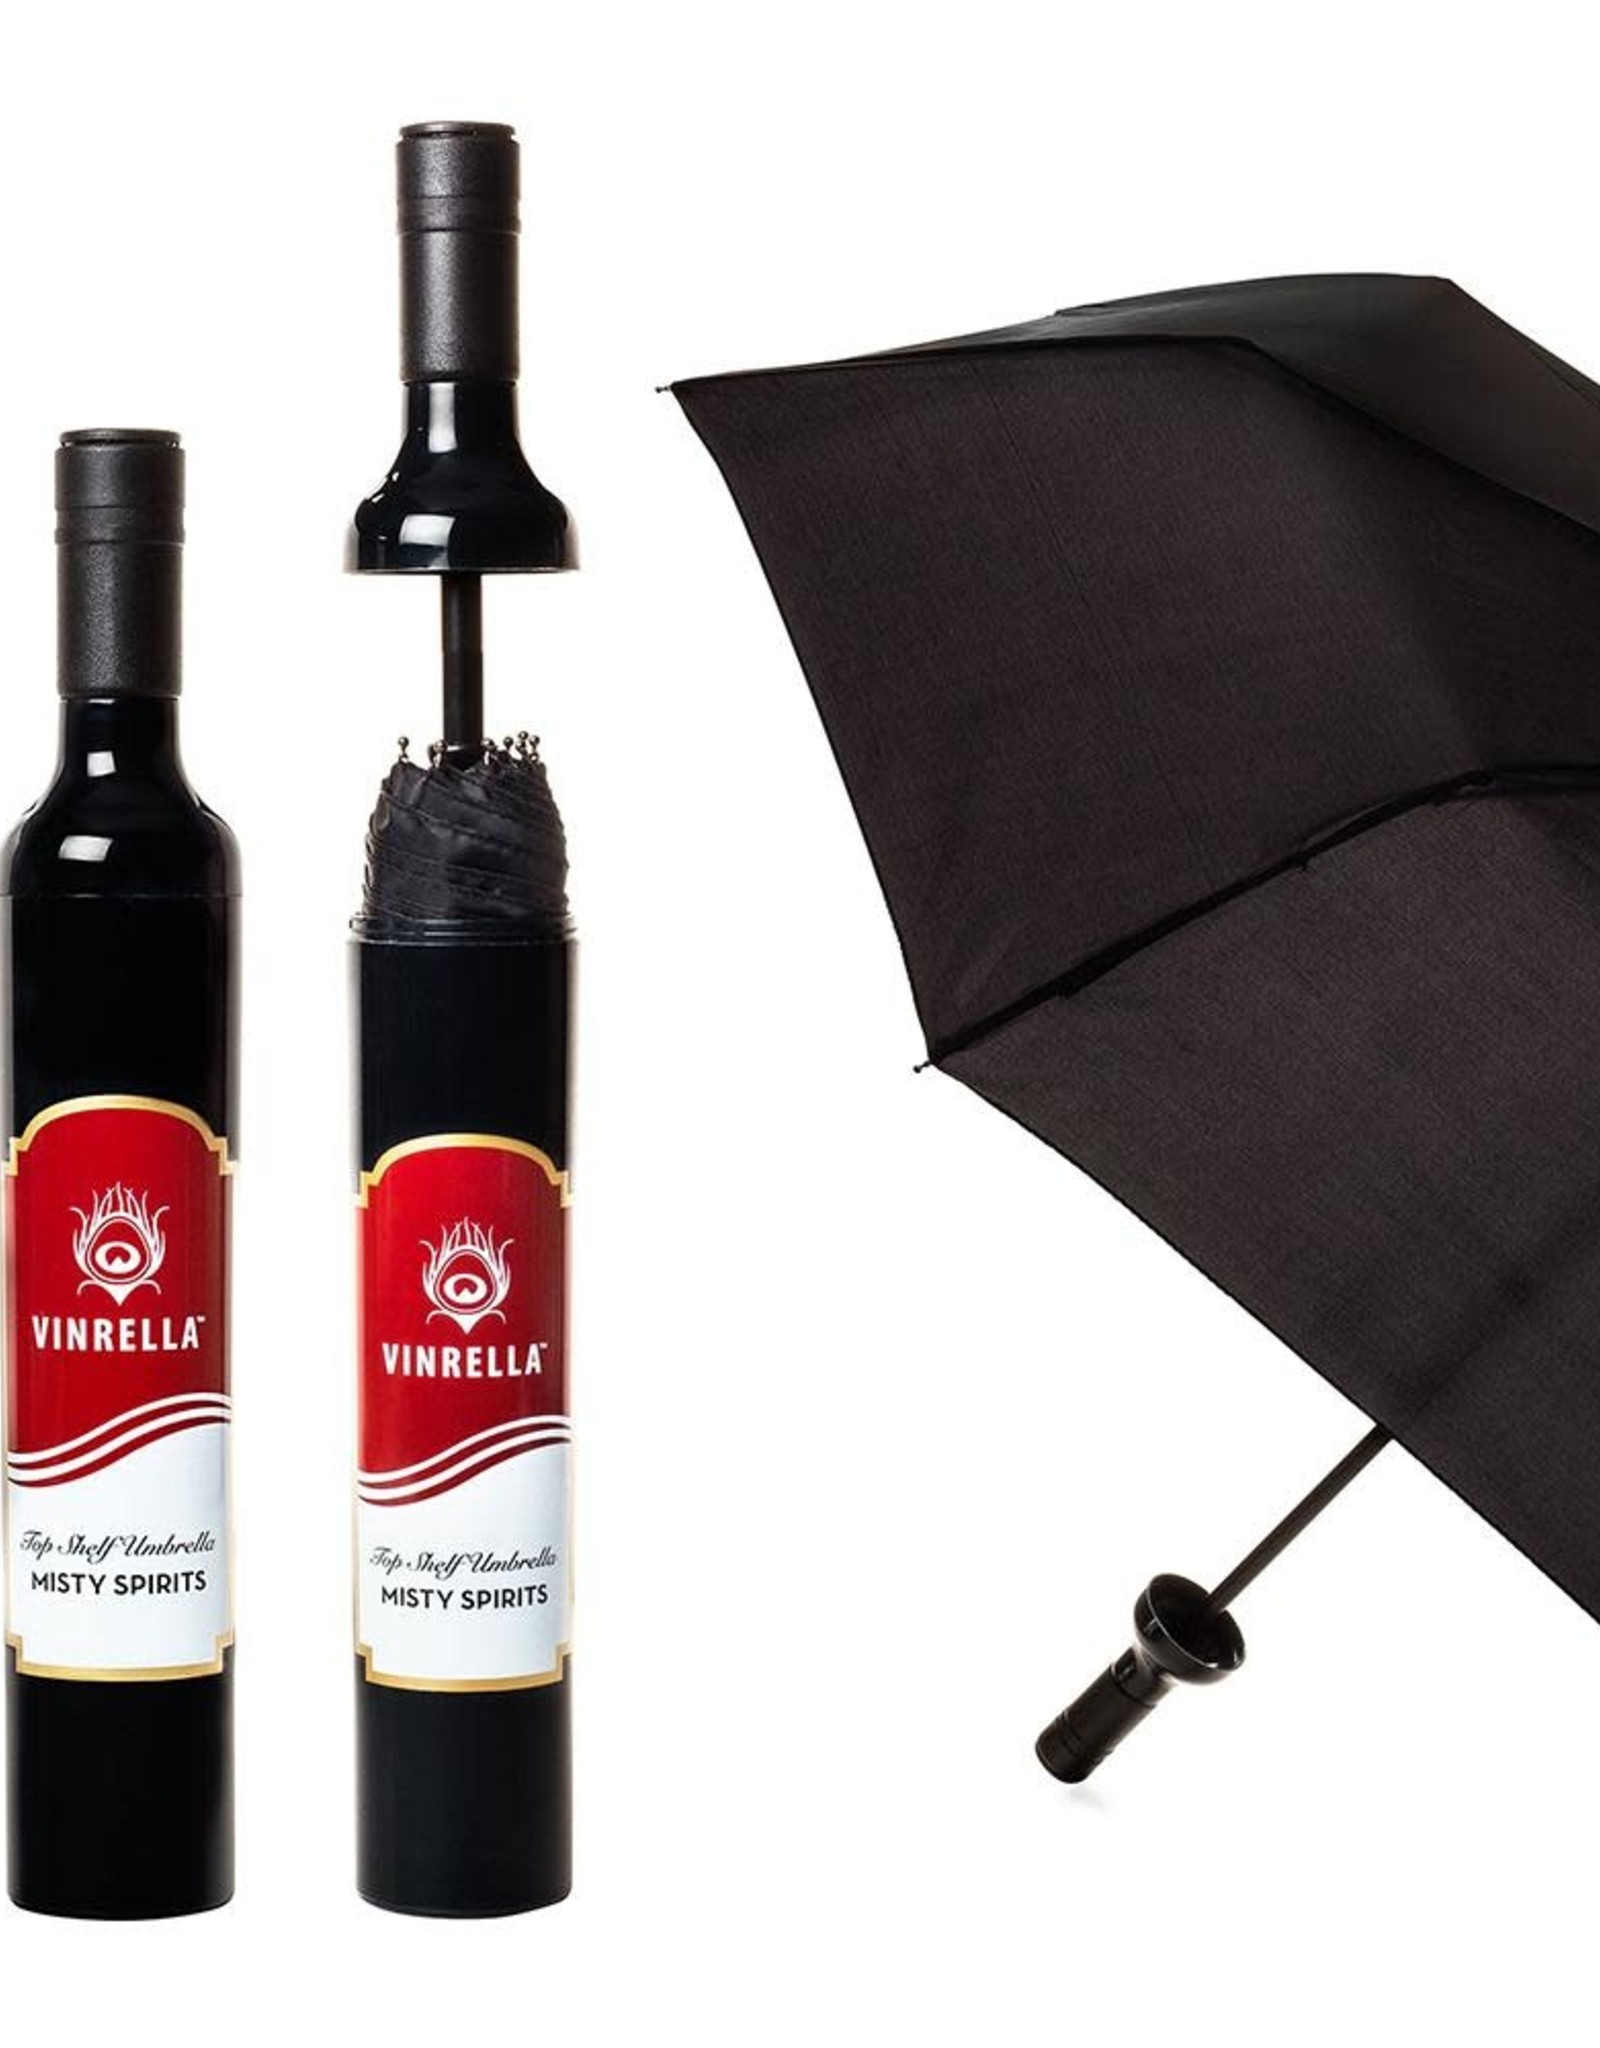 Wine Bottle Umbrella - Misty Spirits